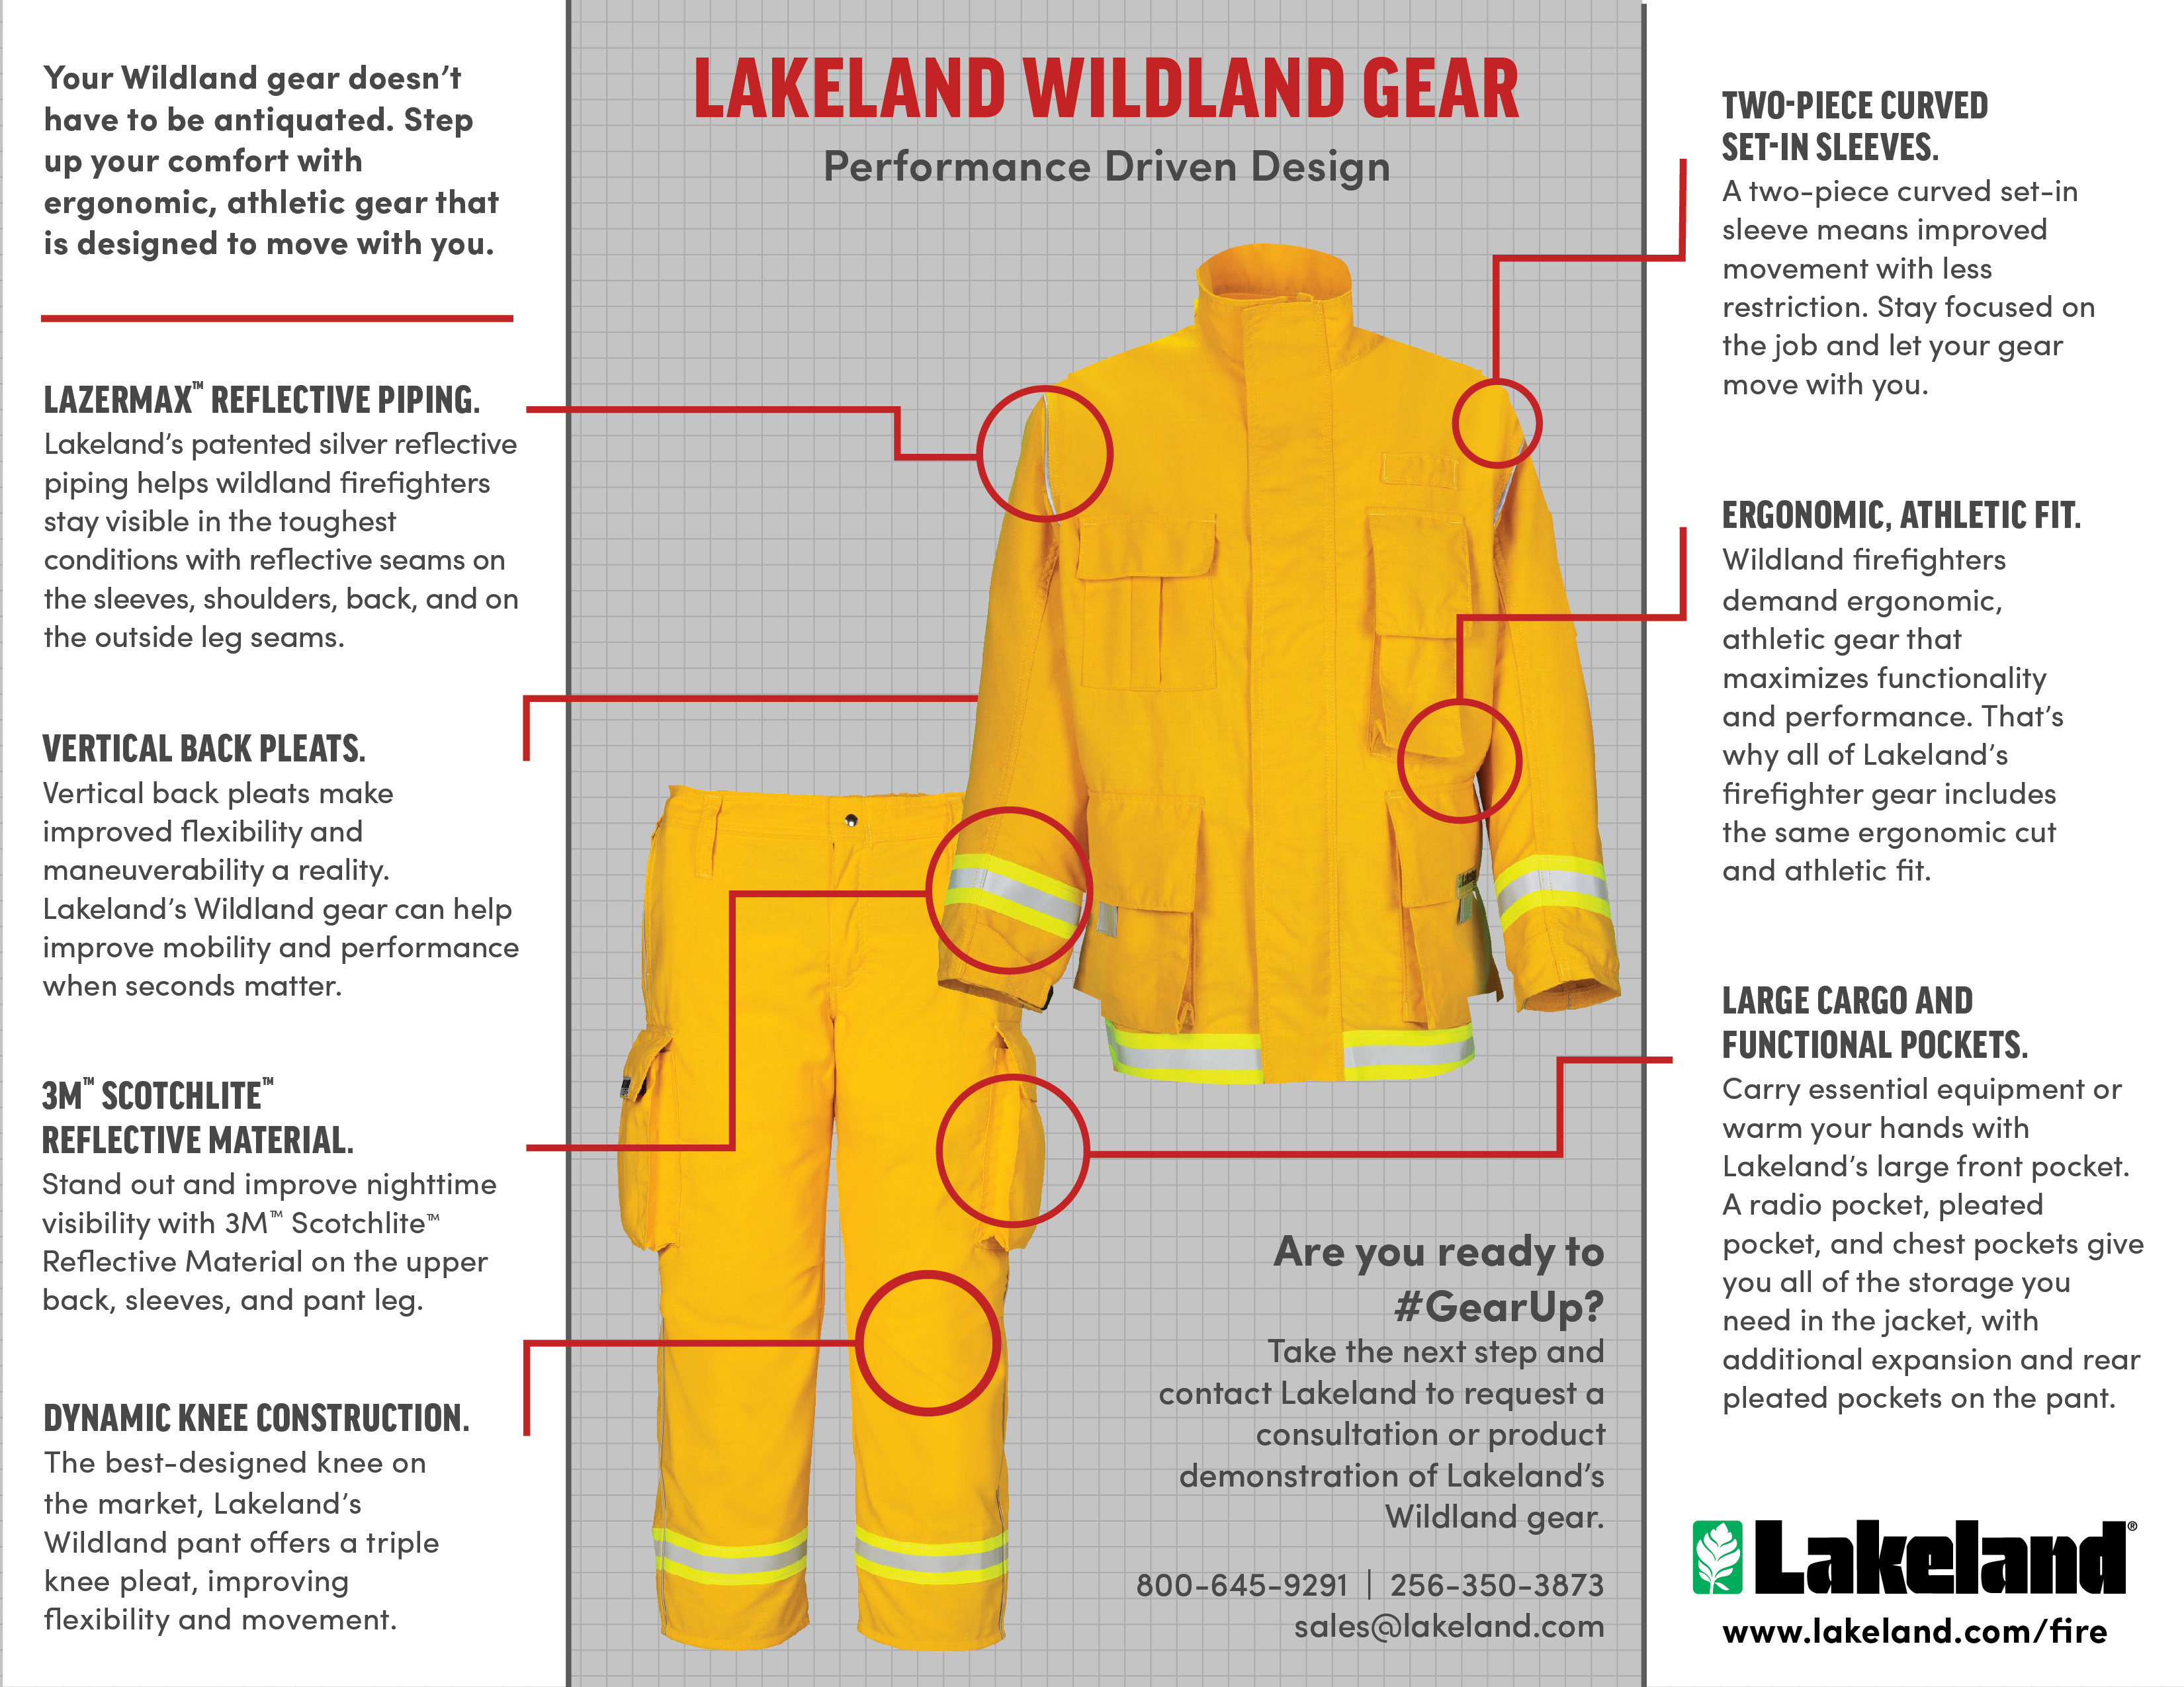 Fire Service | Lakeland